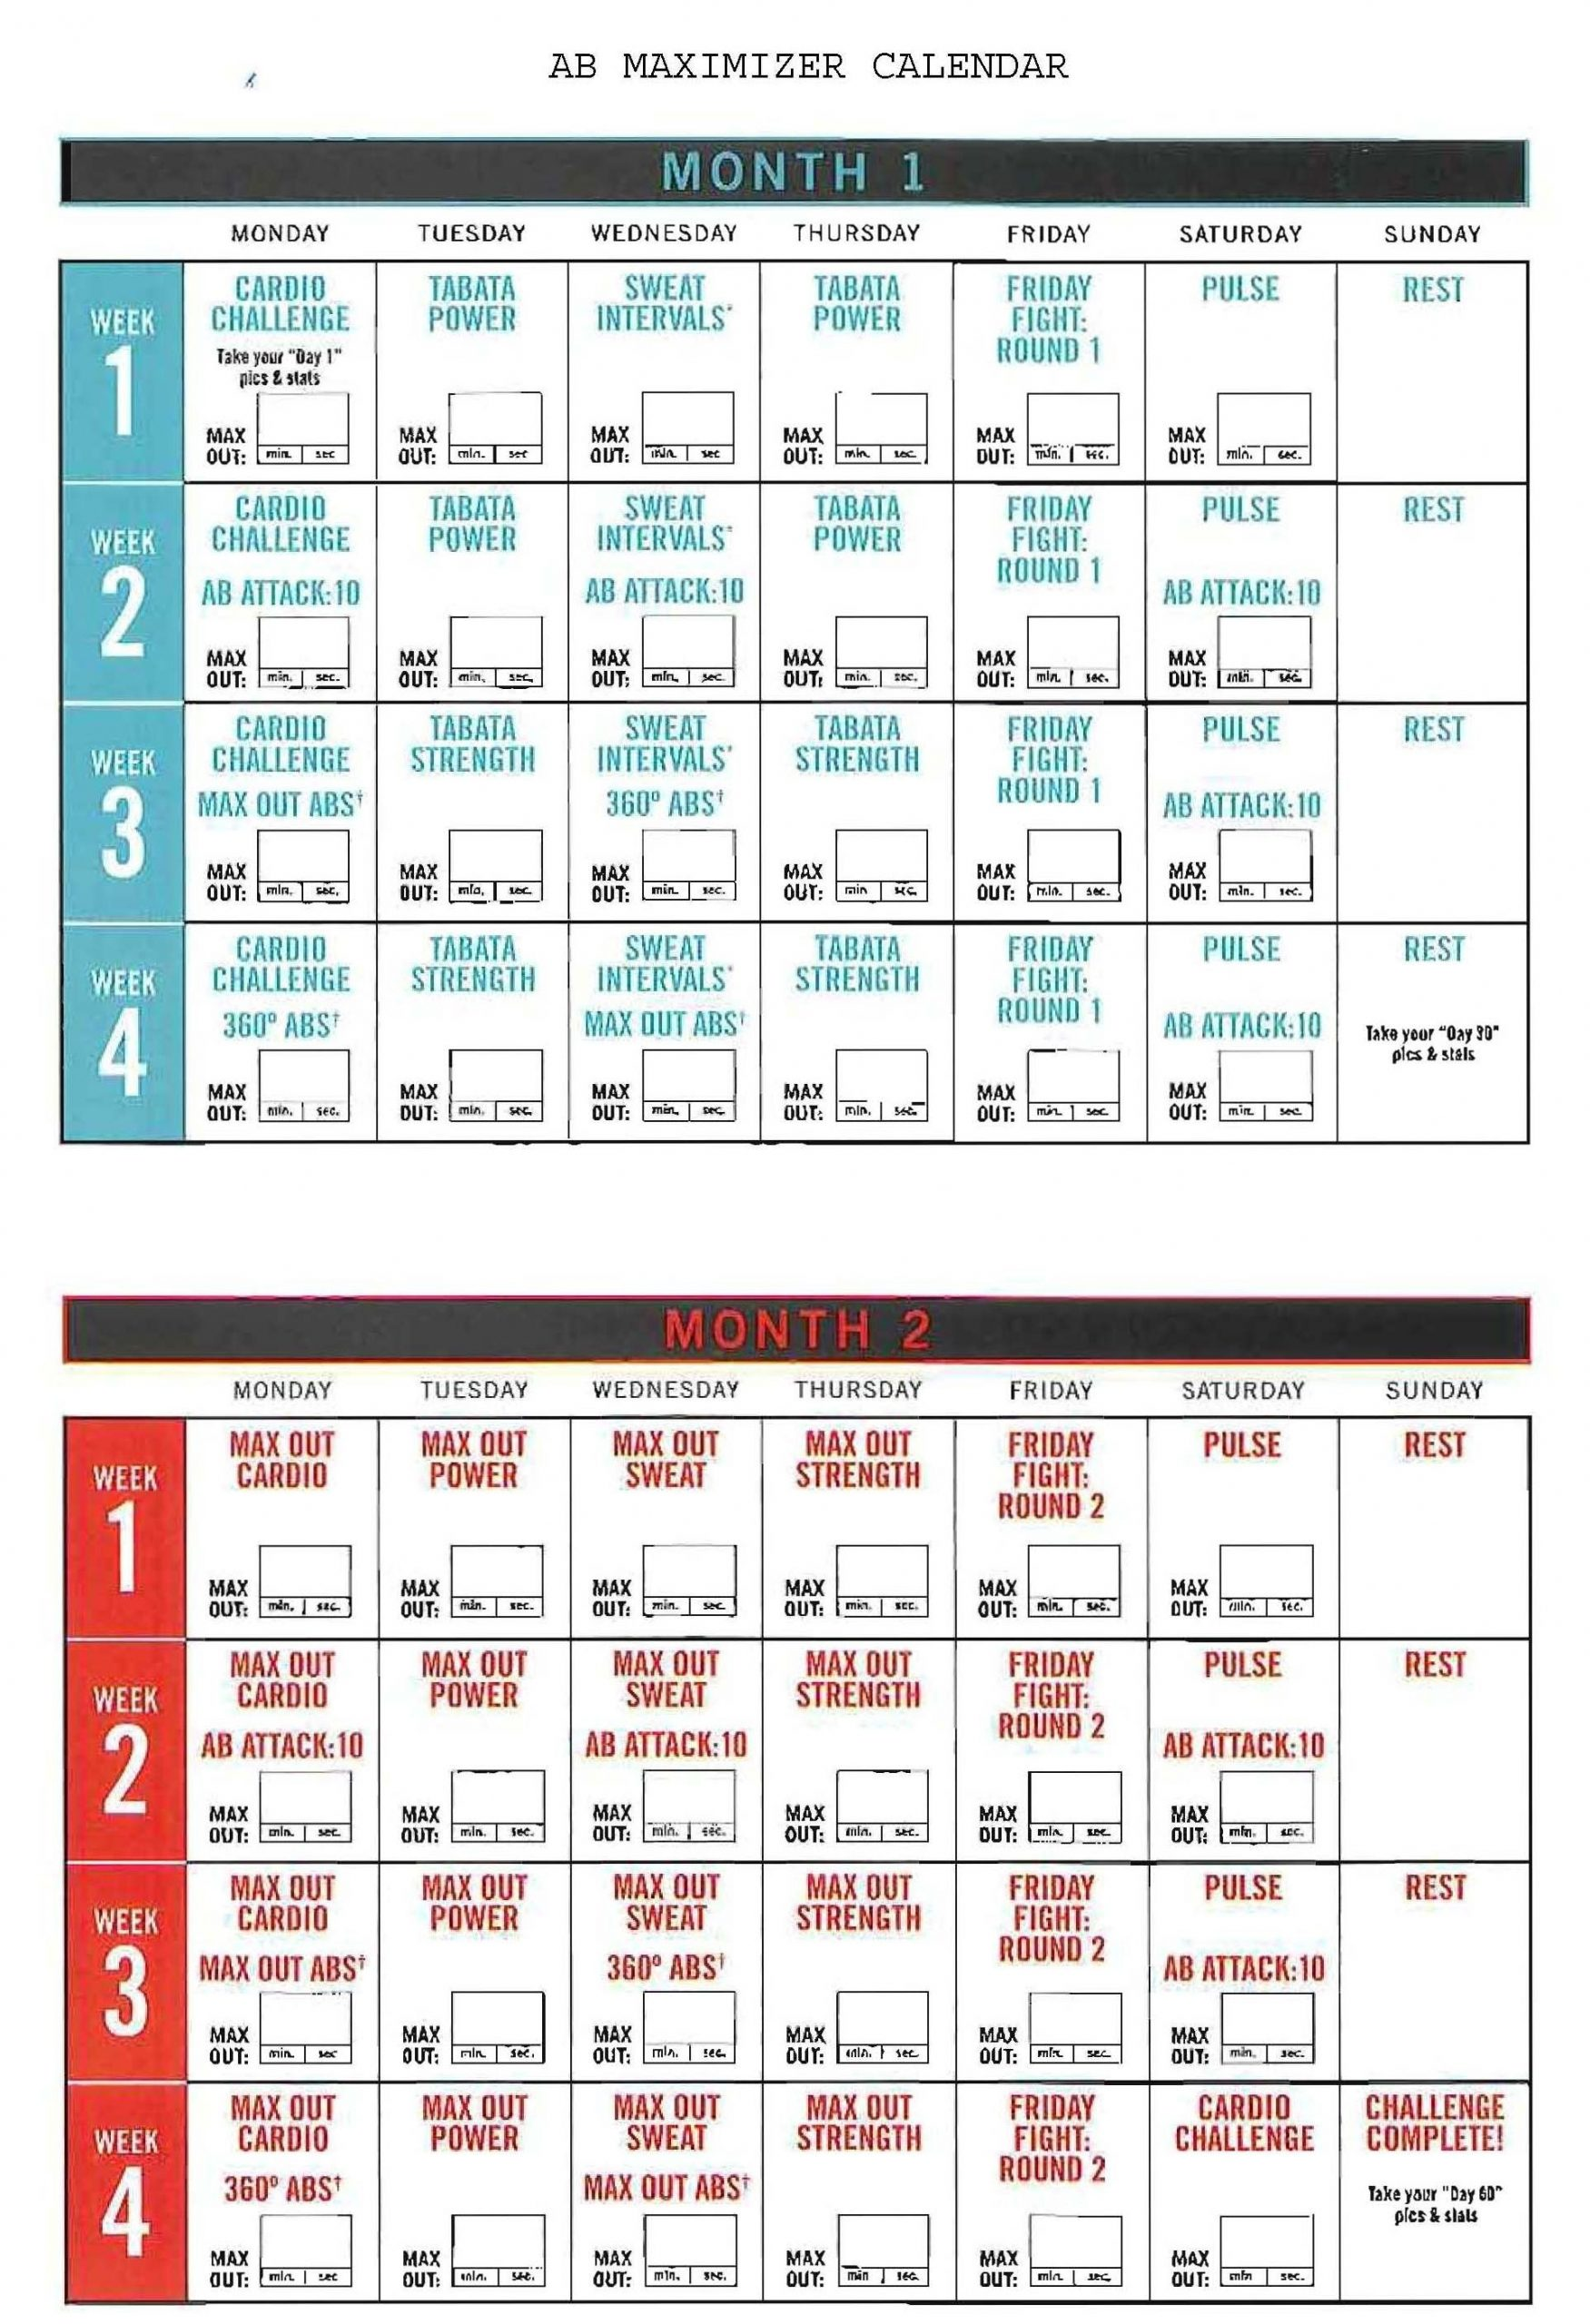 Insanity Ab Maximizer Calendar! Hit Tha Floor - Starting 12